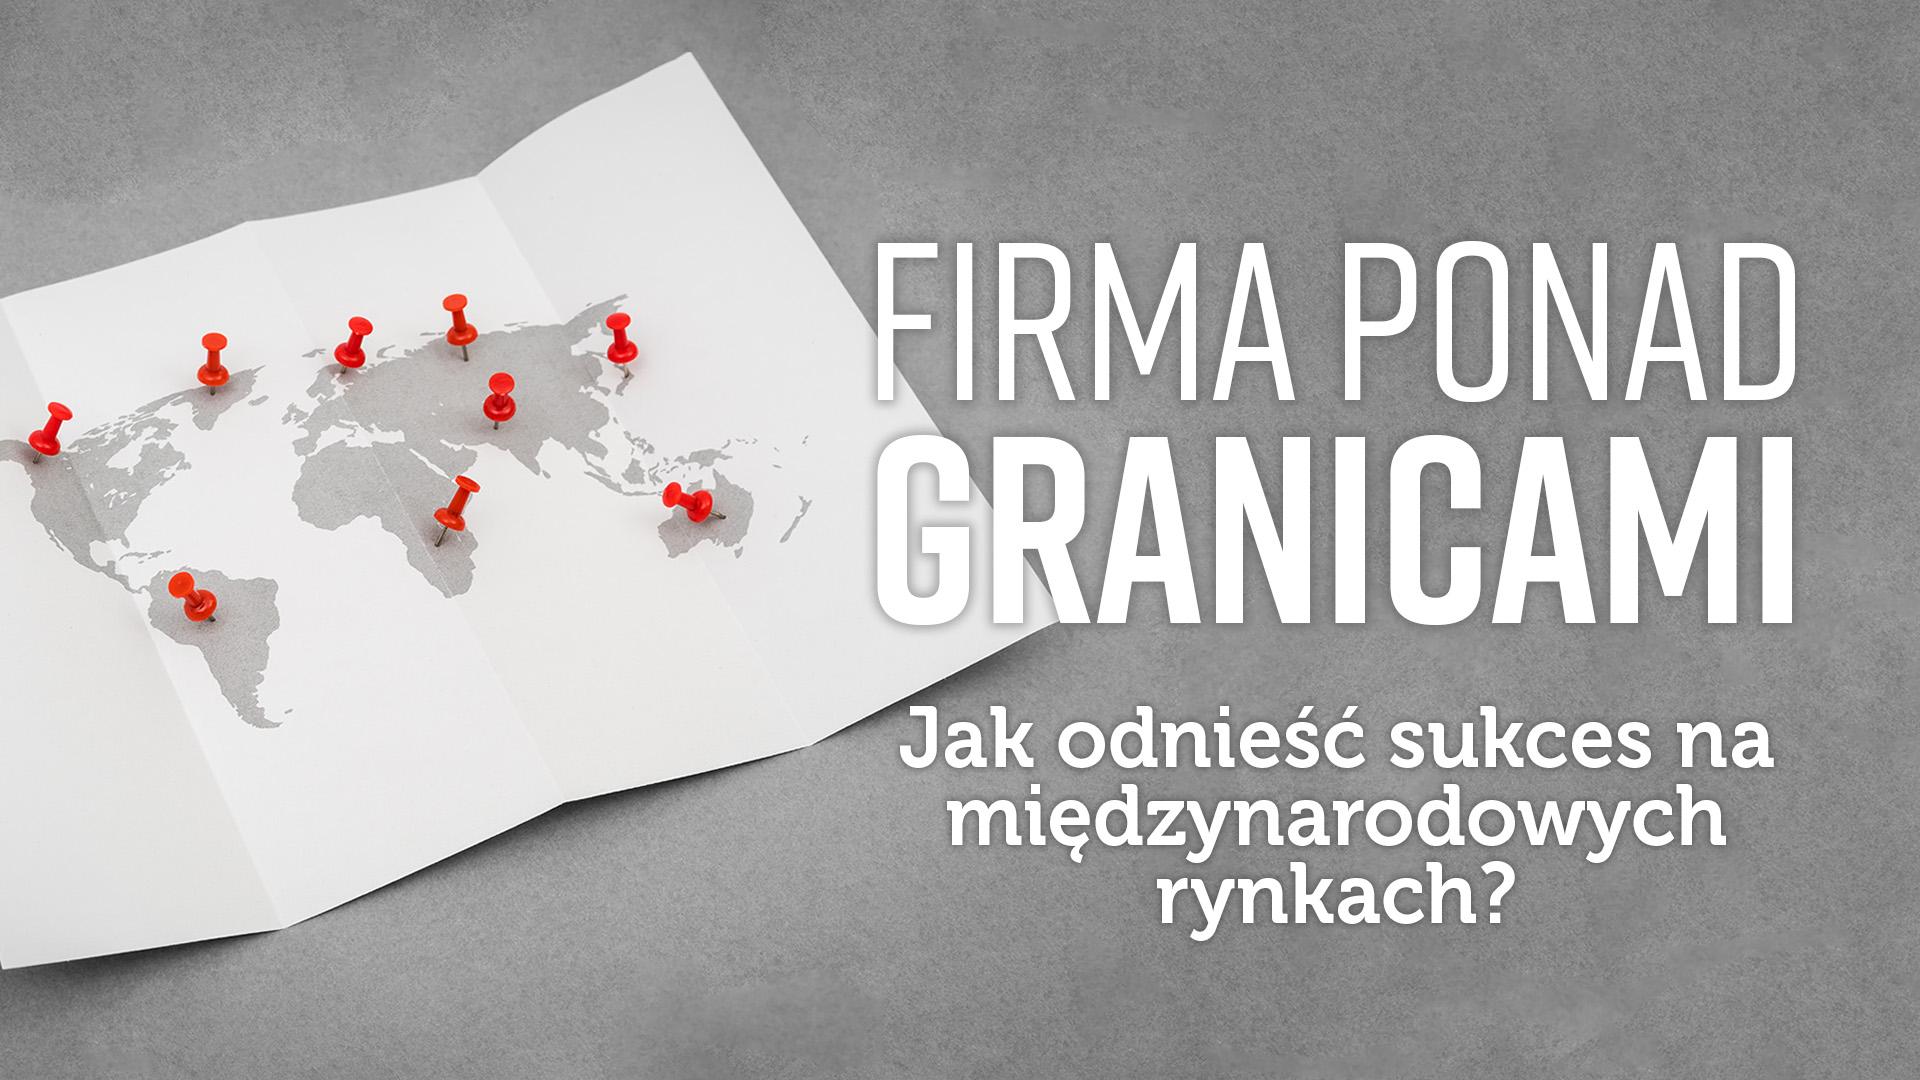 FIRMA PONAD GRANICAMI